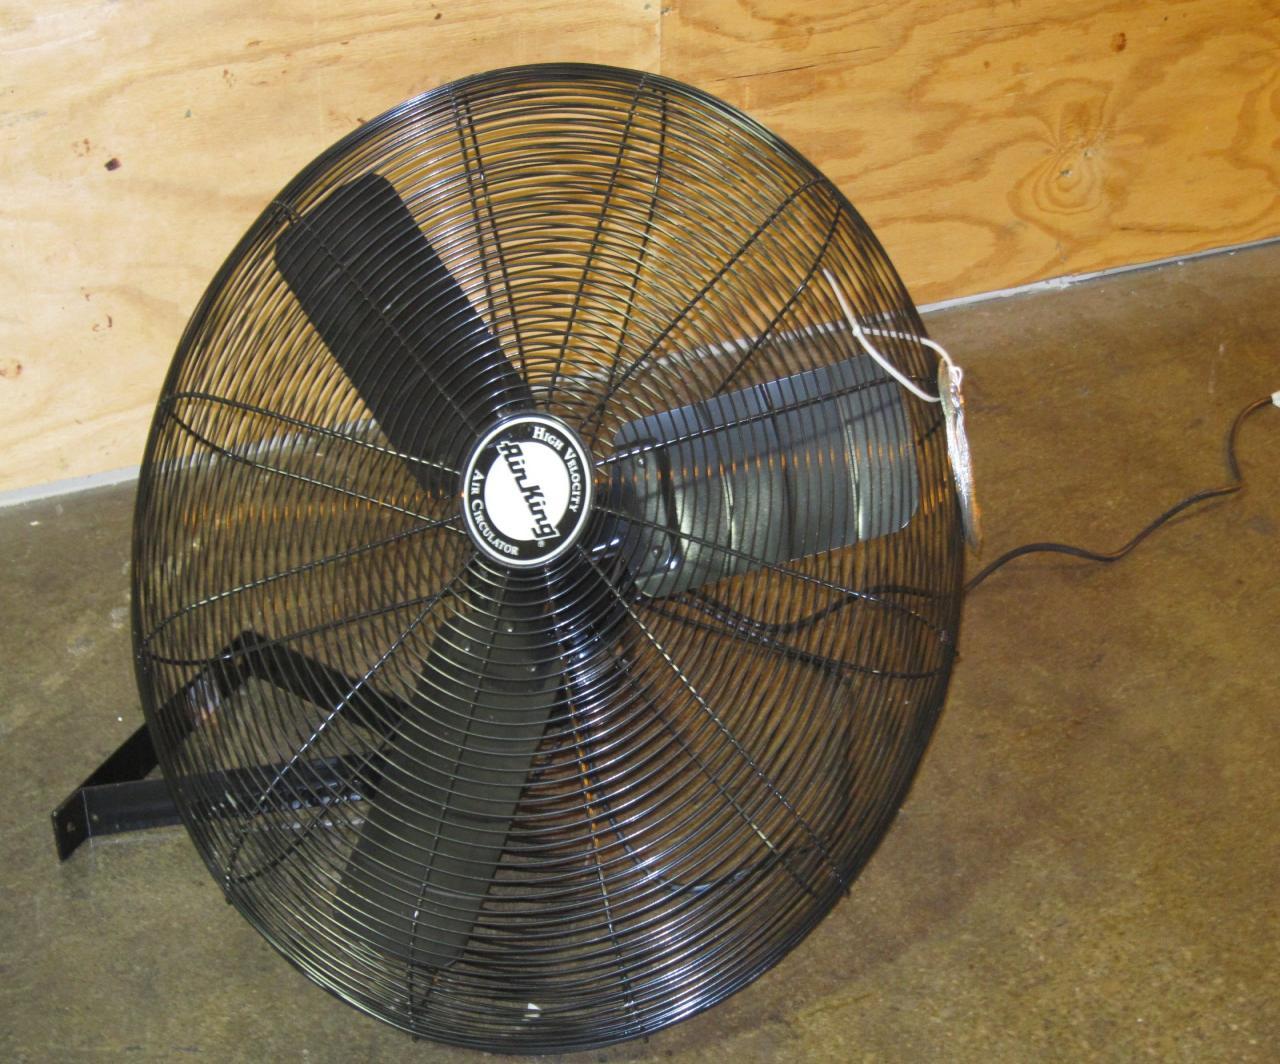 Air King Wall Mount Fan : Lot air king hp industrial grade wall mount